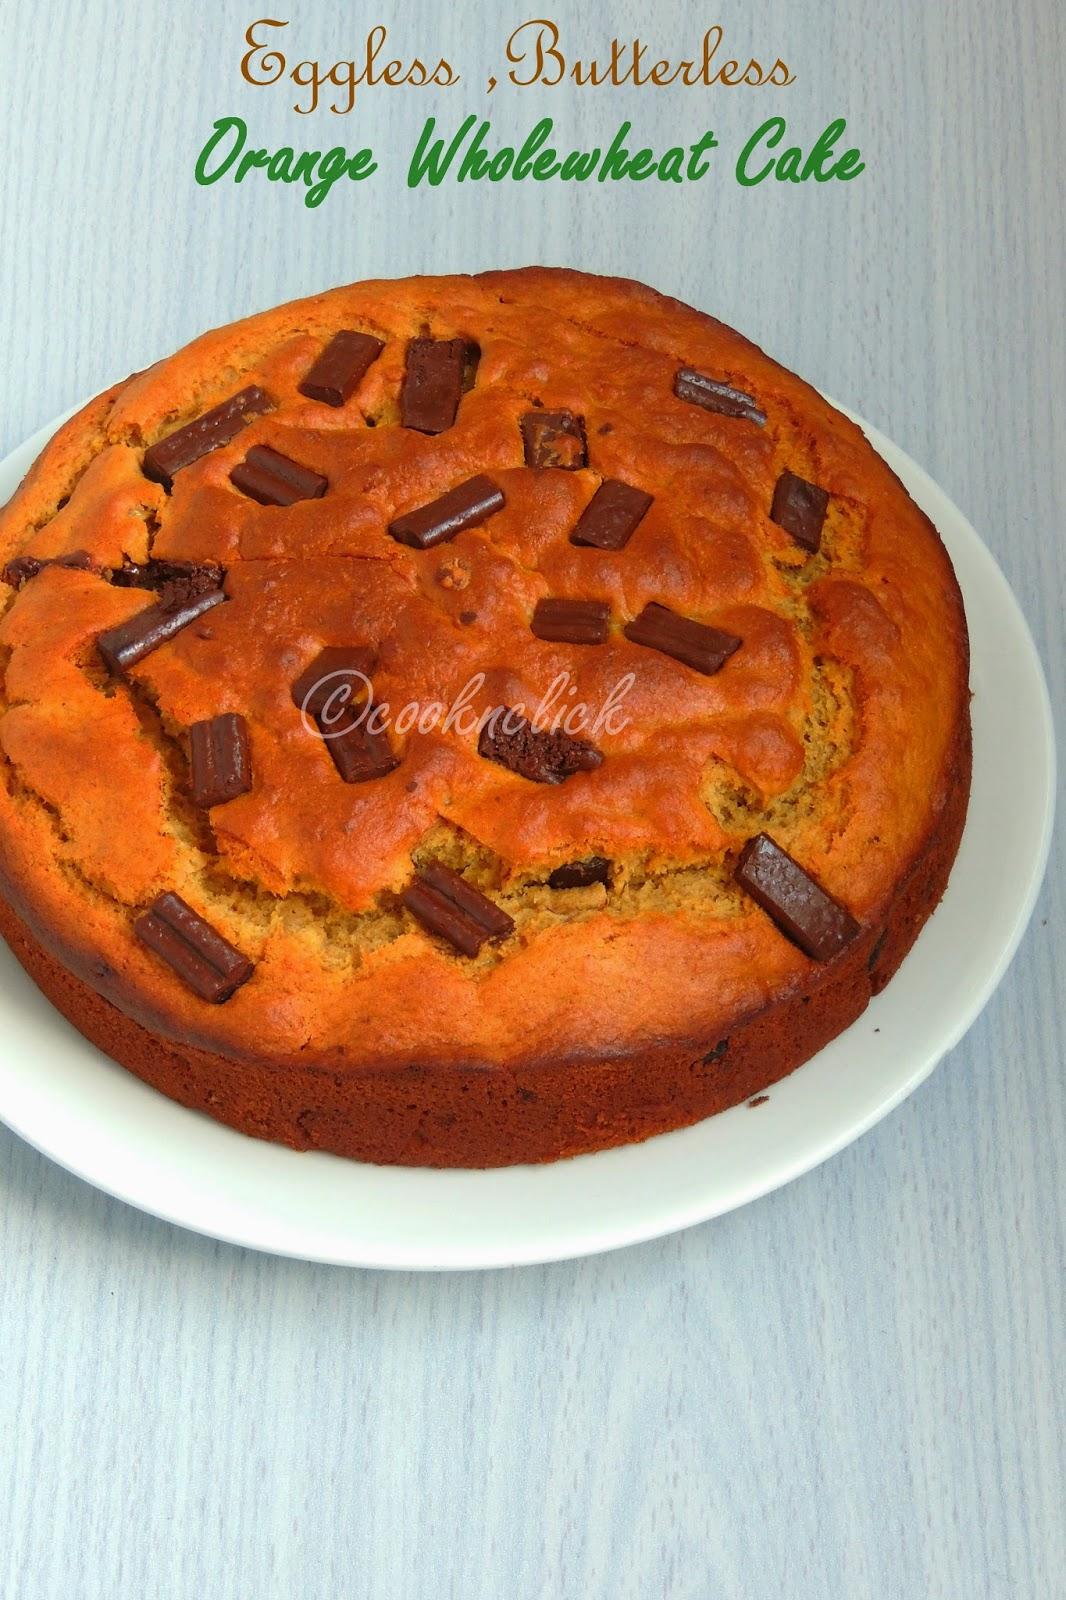 Eggless butterless orange chocolate wholewheat cake